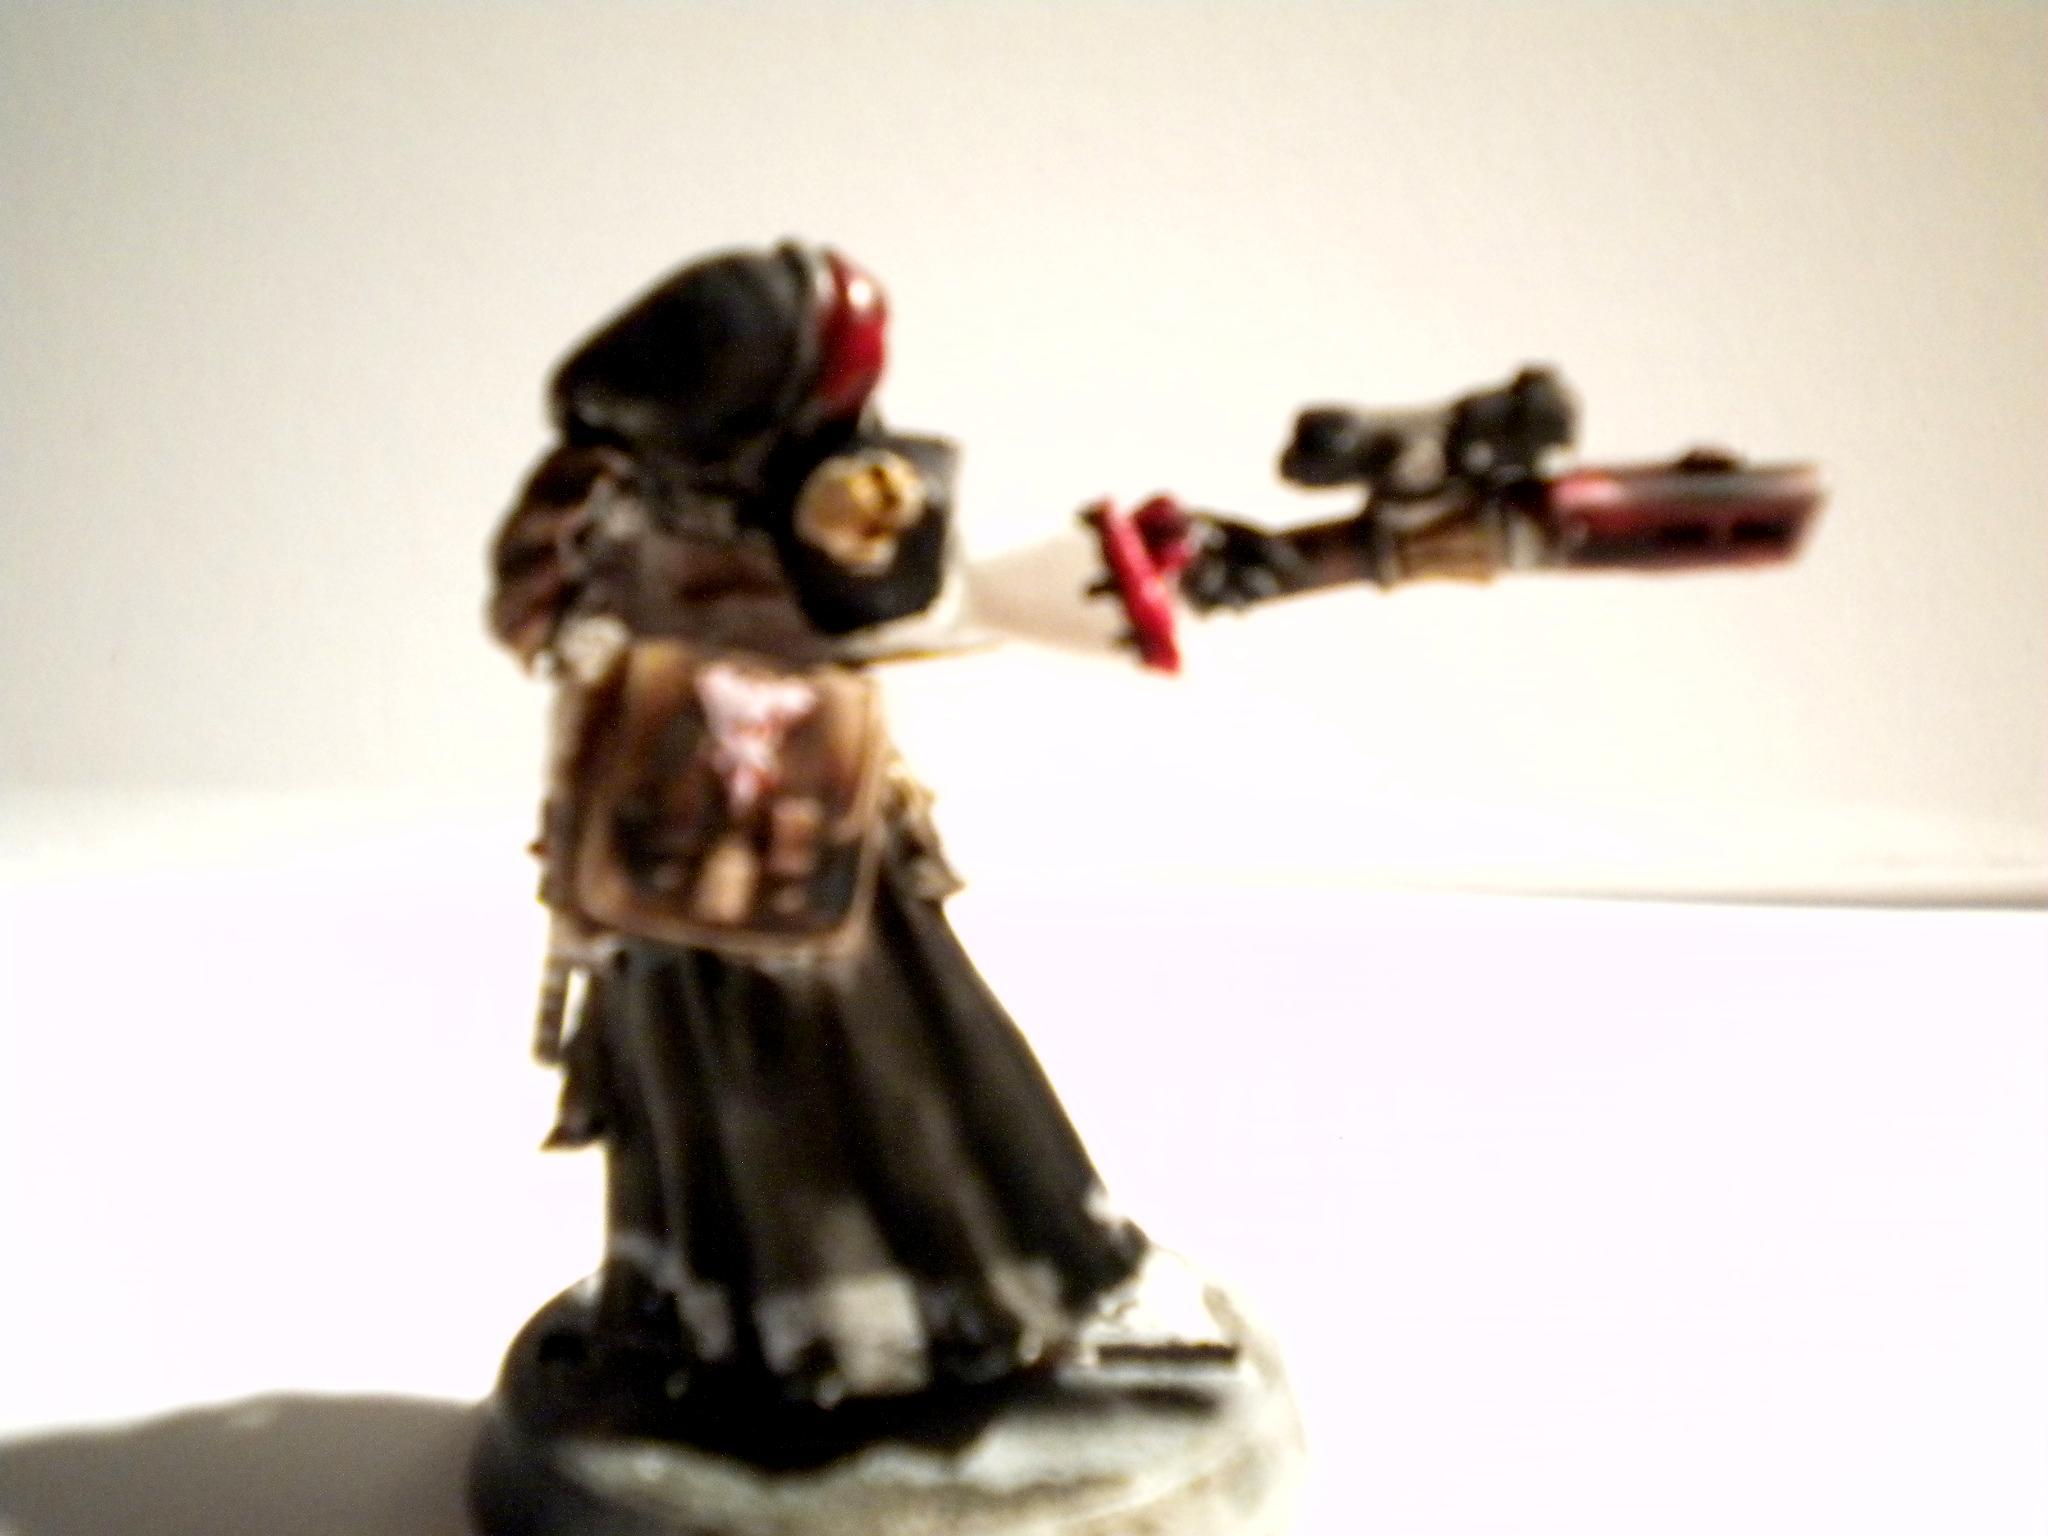 Inquisitor Valencia